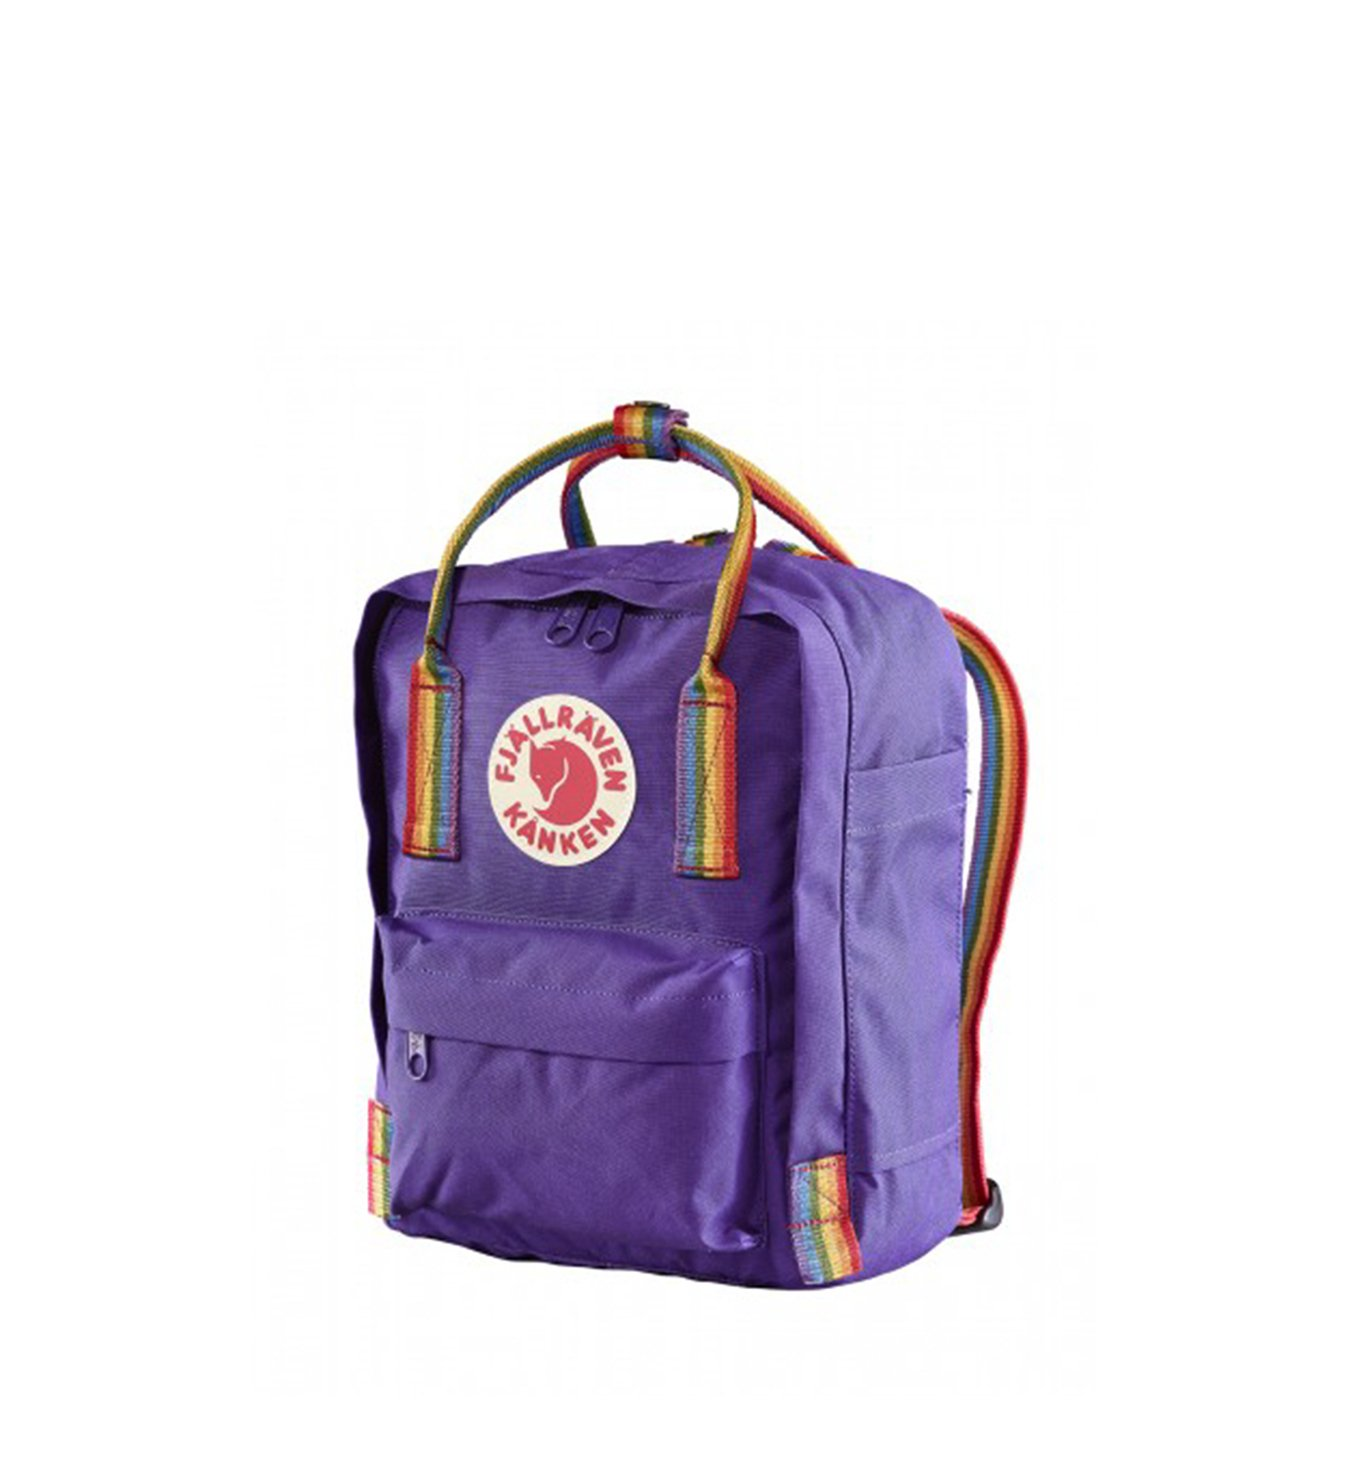 562905ea4b2 Fjallraven Kanken Rainbow Mini Purple Rainbow Kliknij, aby powiększyć ...